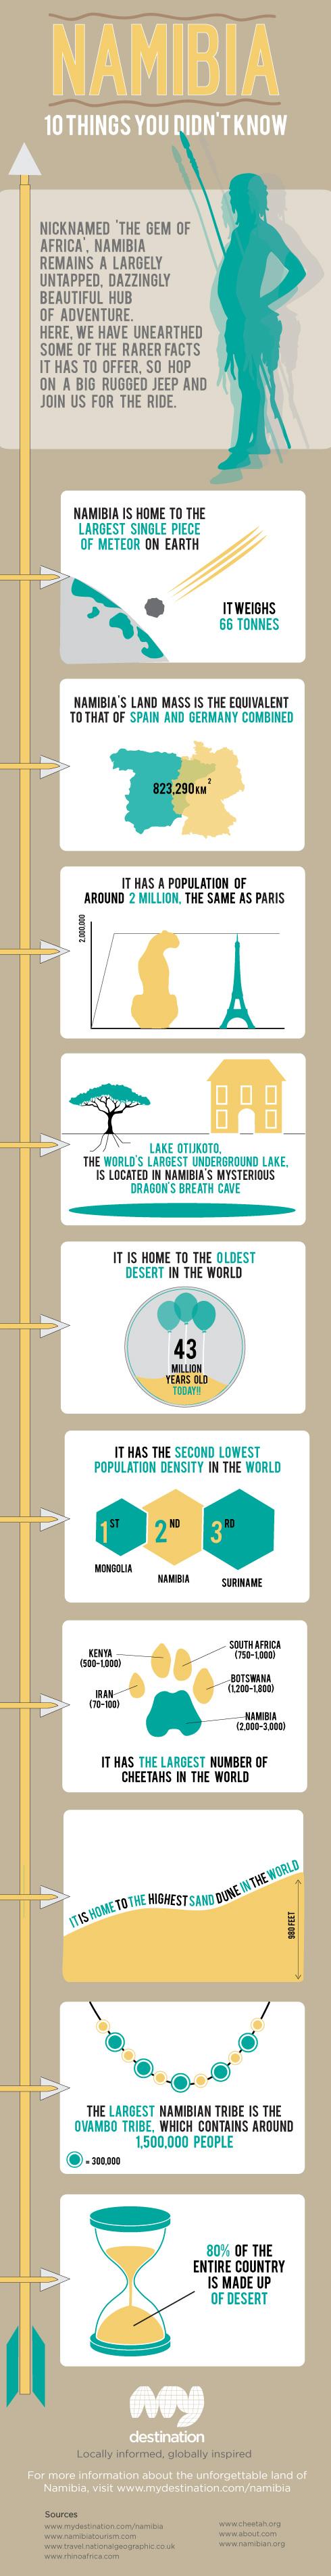 Namibia-Infographic-x4906